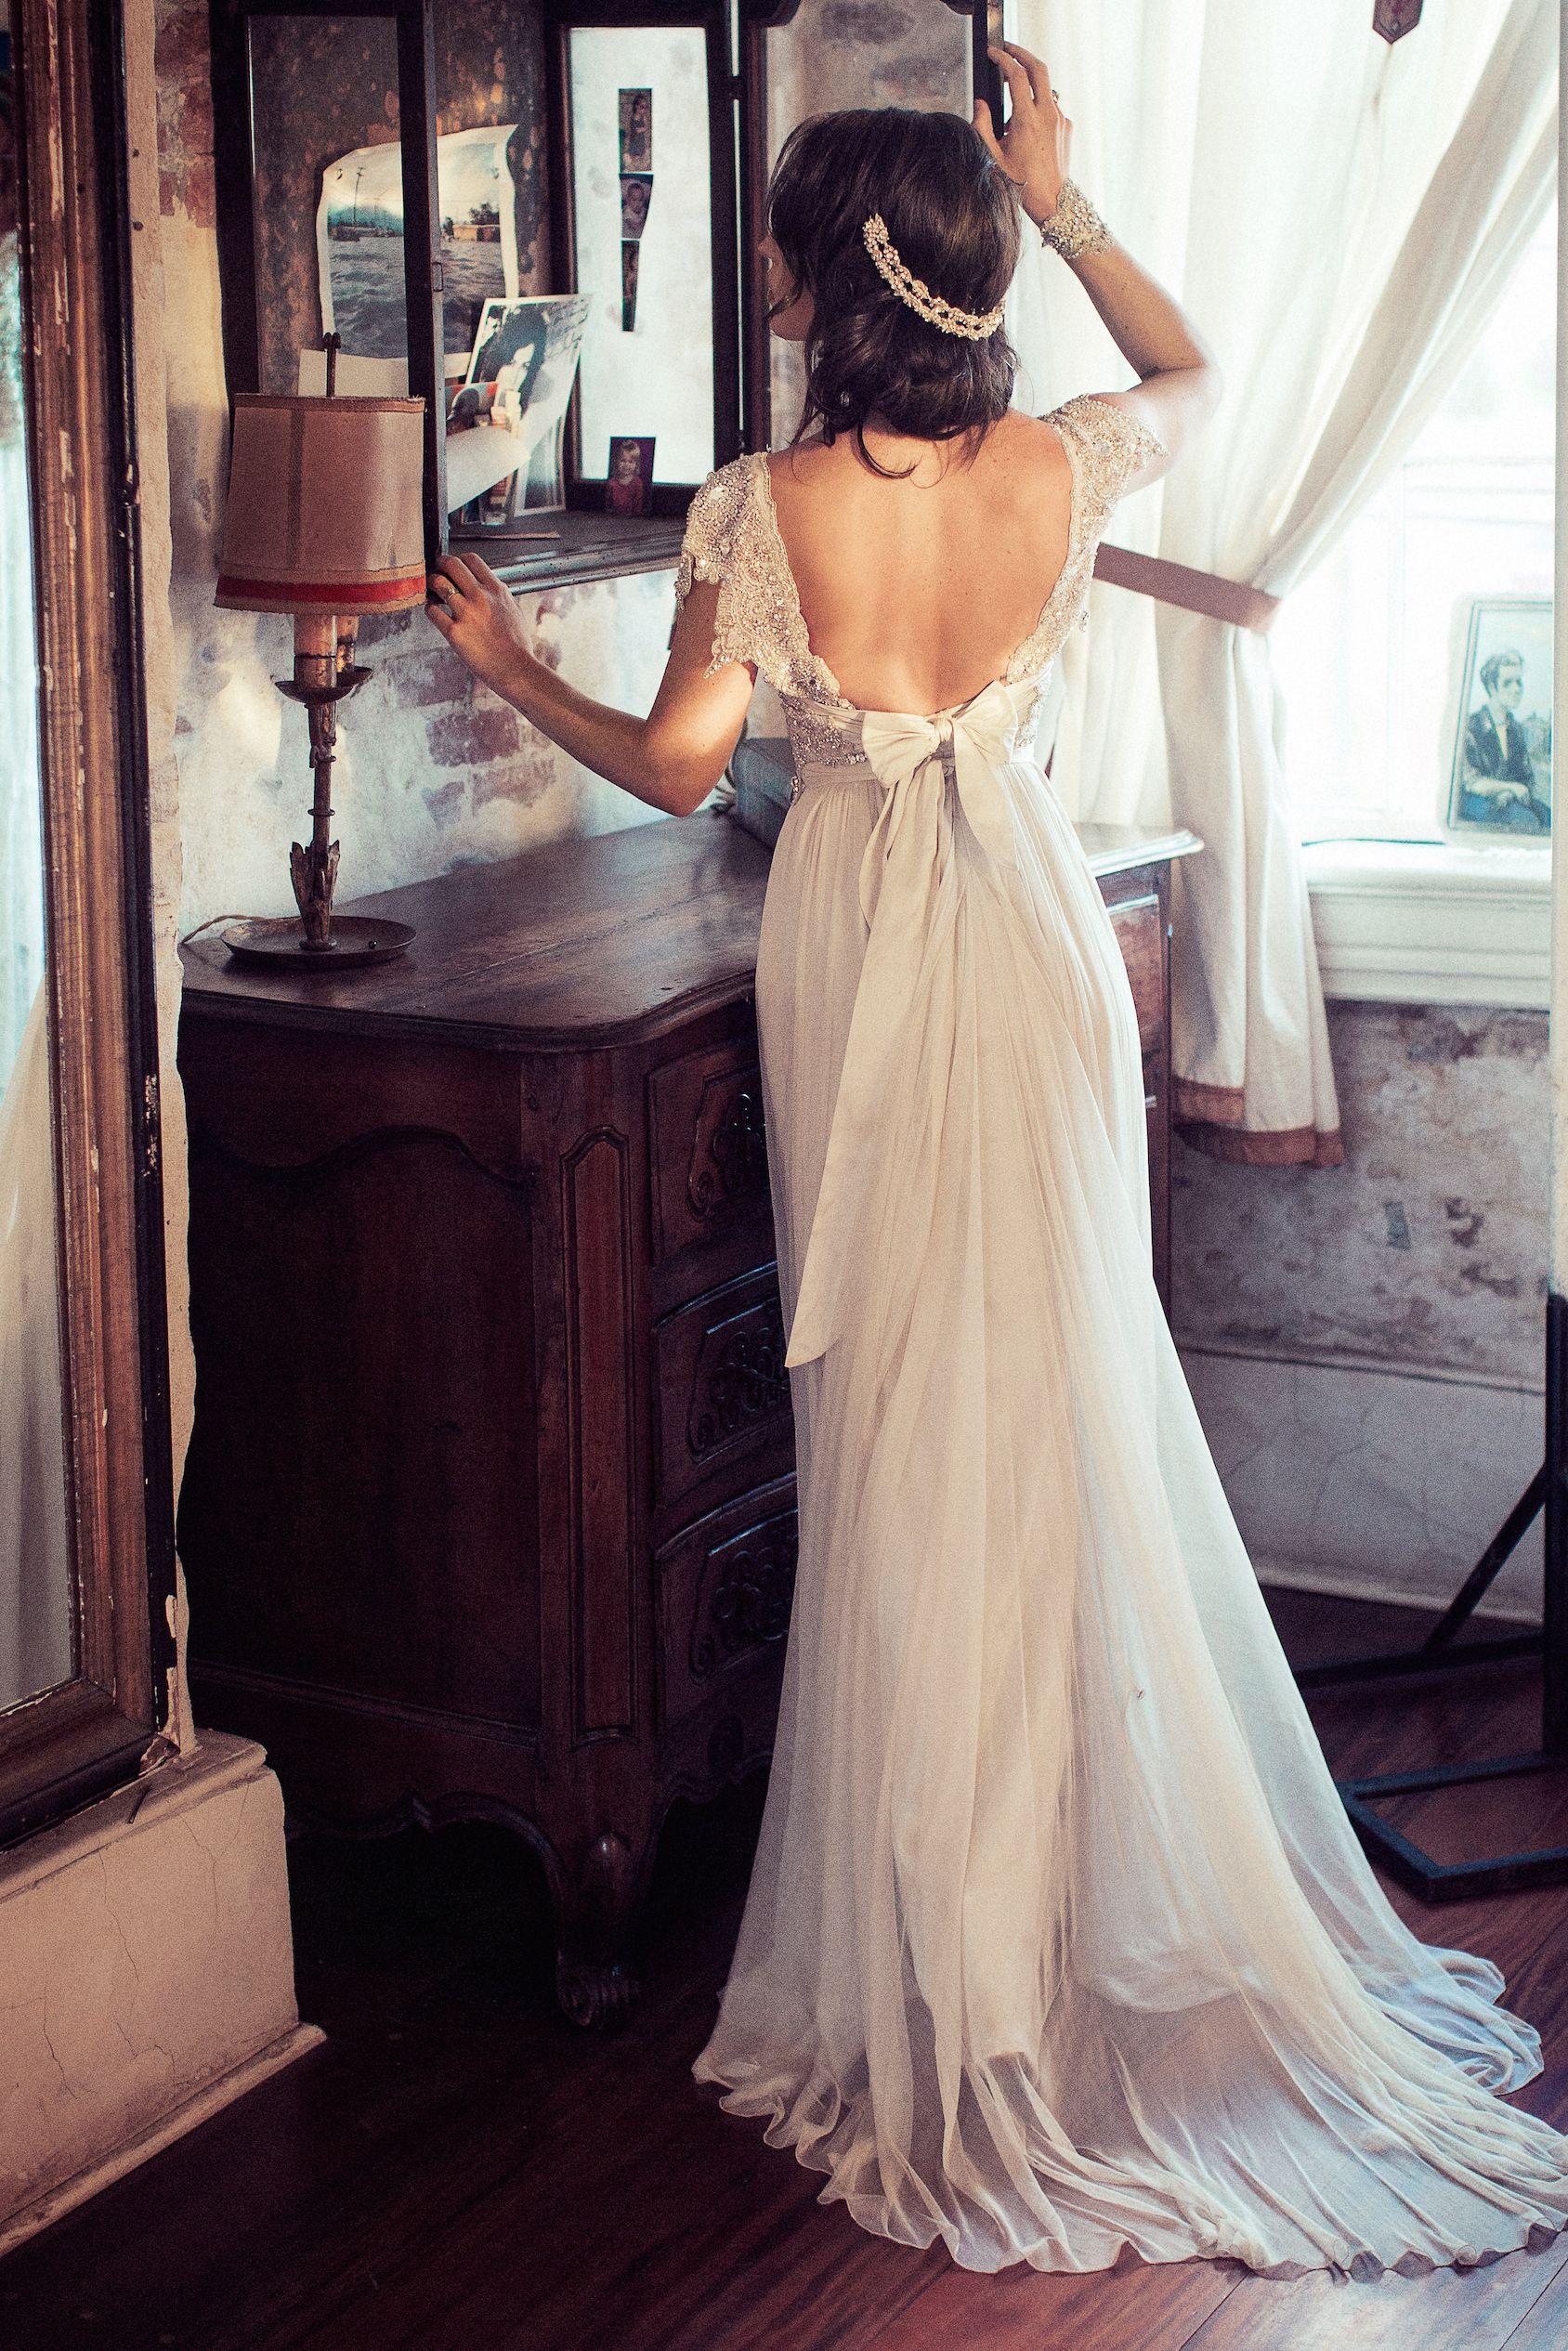 Nontraditional wedding dresses nontraditional wedding bohemian bridal blog anna campbell vintage inspired wedding dresses bridal designer melbourne ombrellifo Choice Image